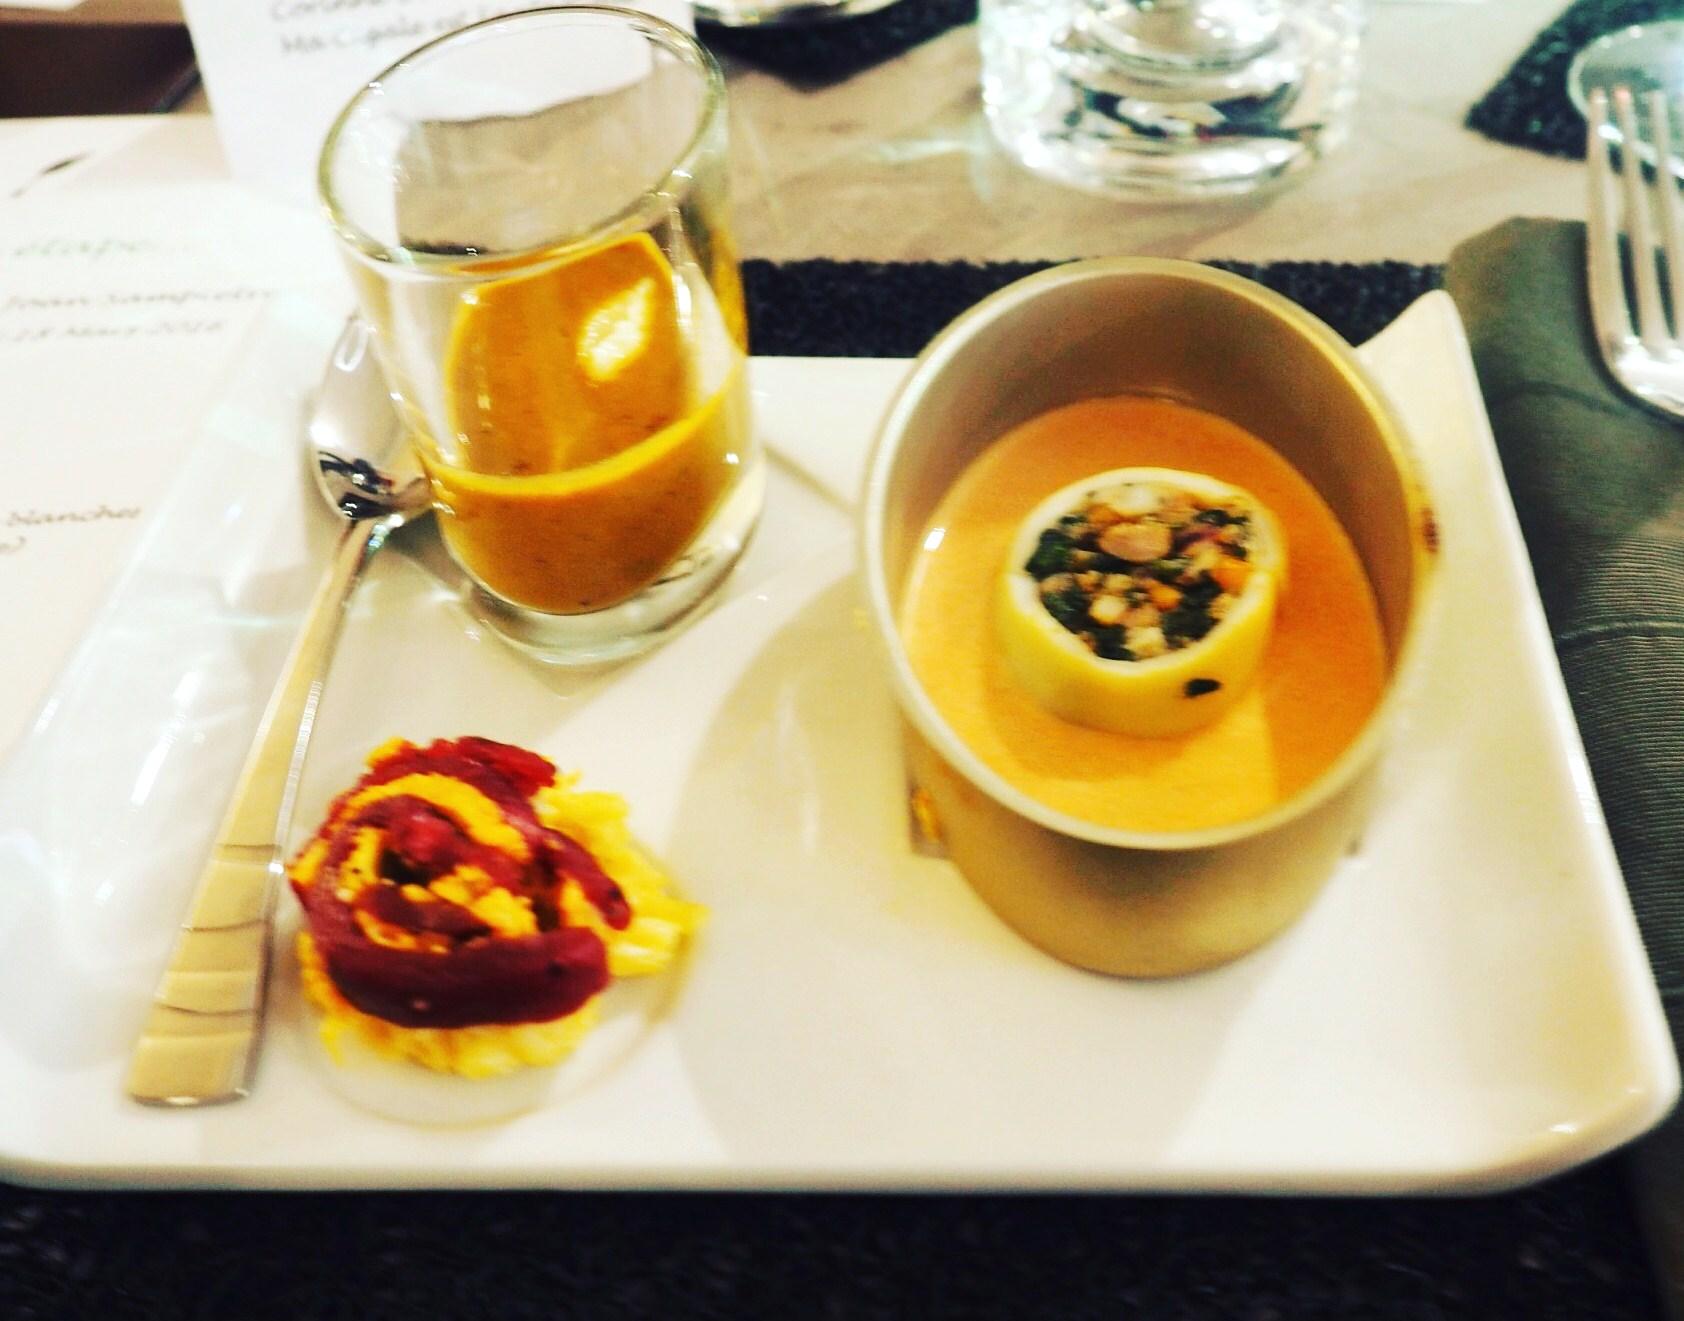 Déjeuner à 4 mains - Jany Gleize & Joan Sampietro